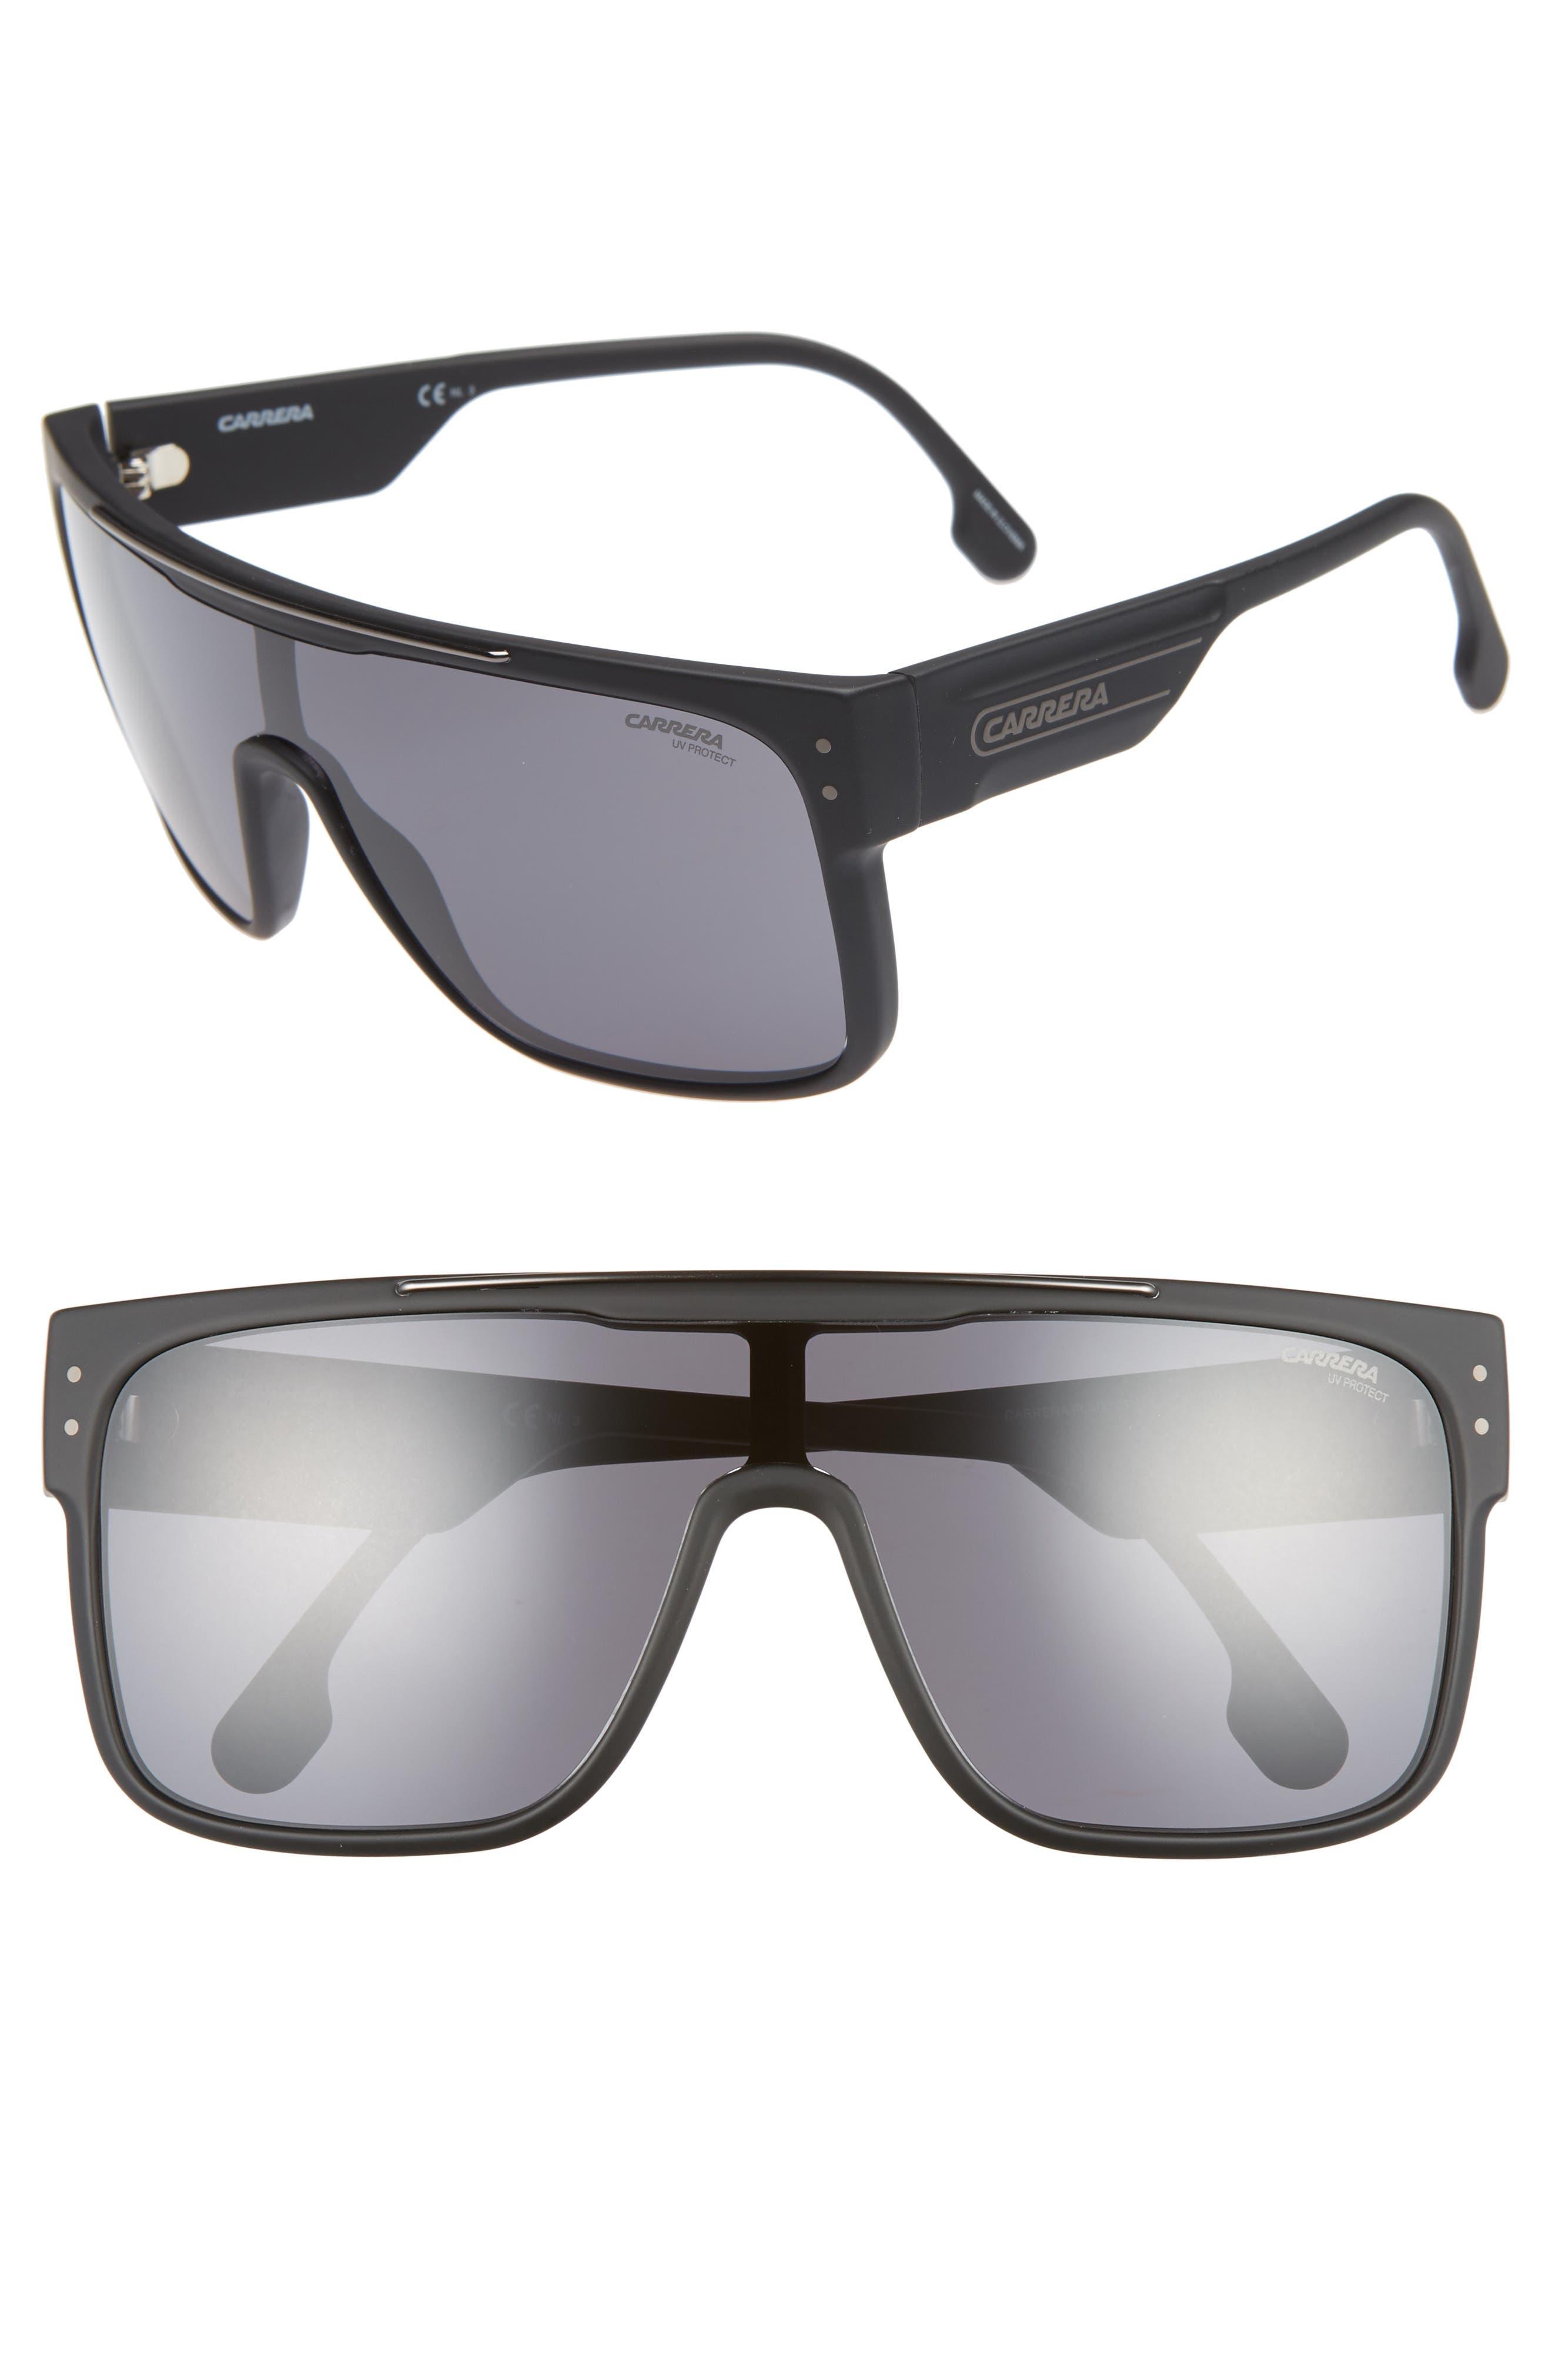 Carrera Eyewear Flagstop Ii 140Mm Flat Top Sunglasses - Matte Black